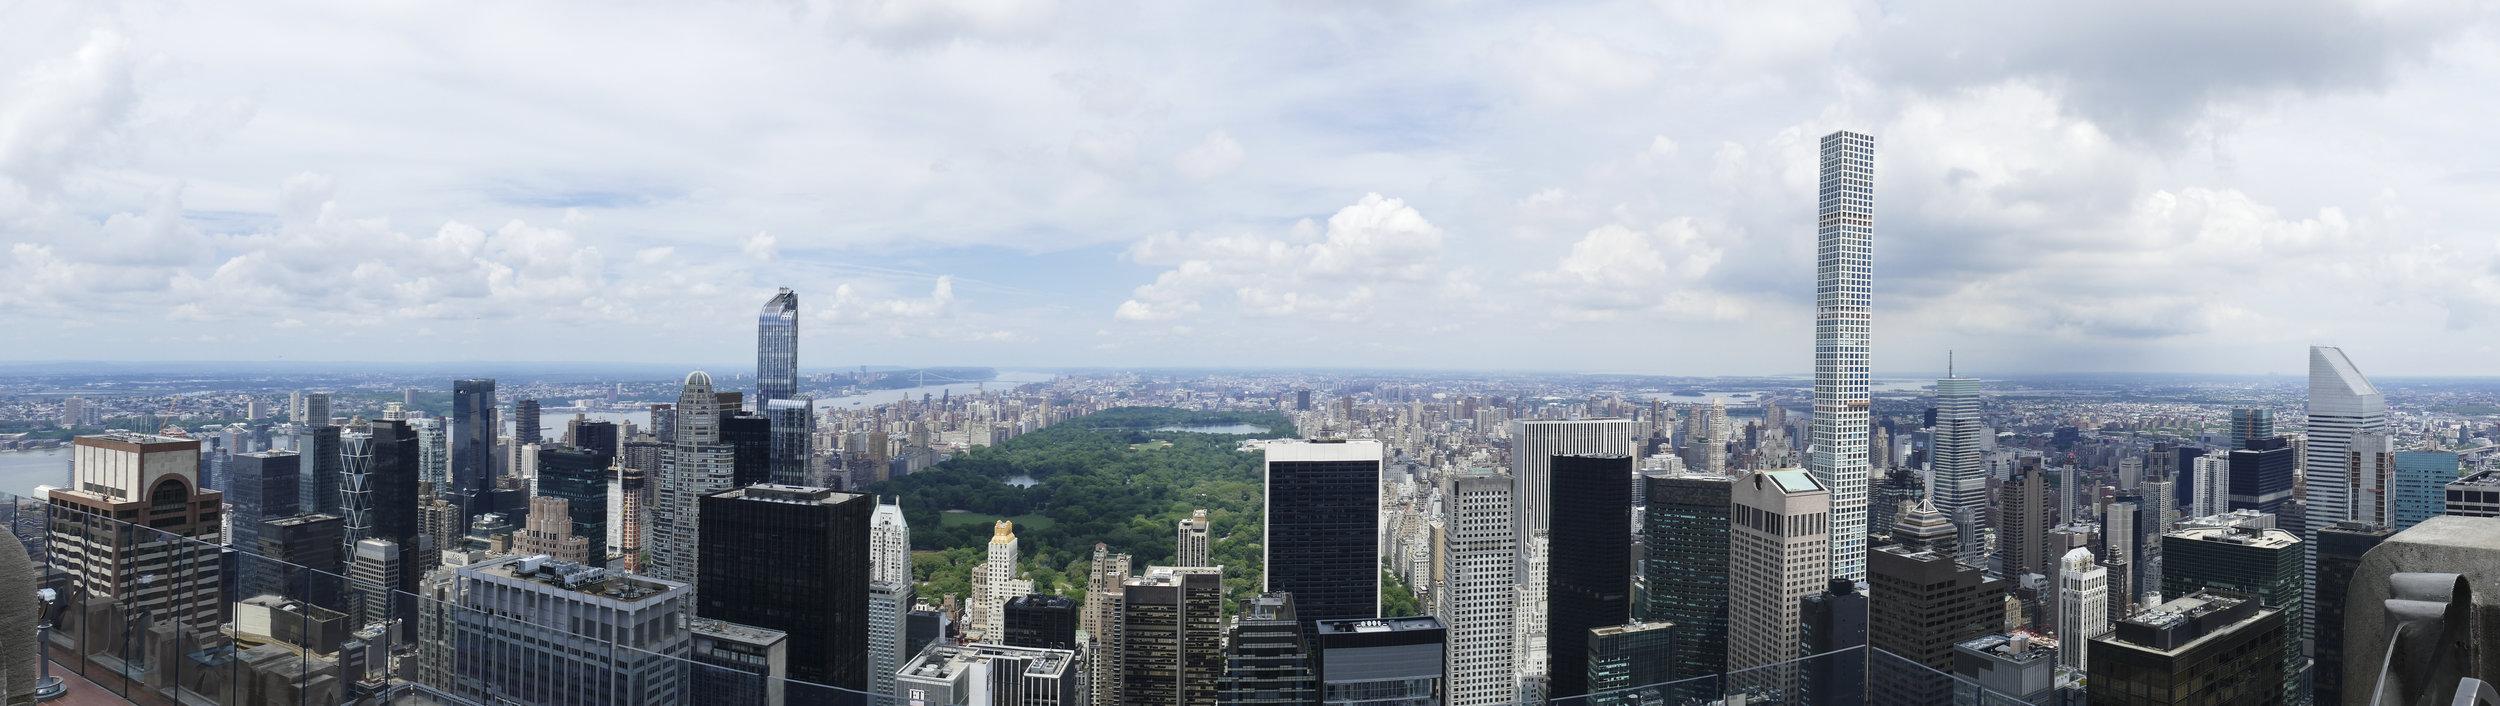 NYC-08.jpg